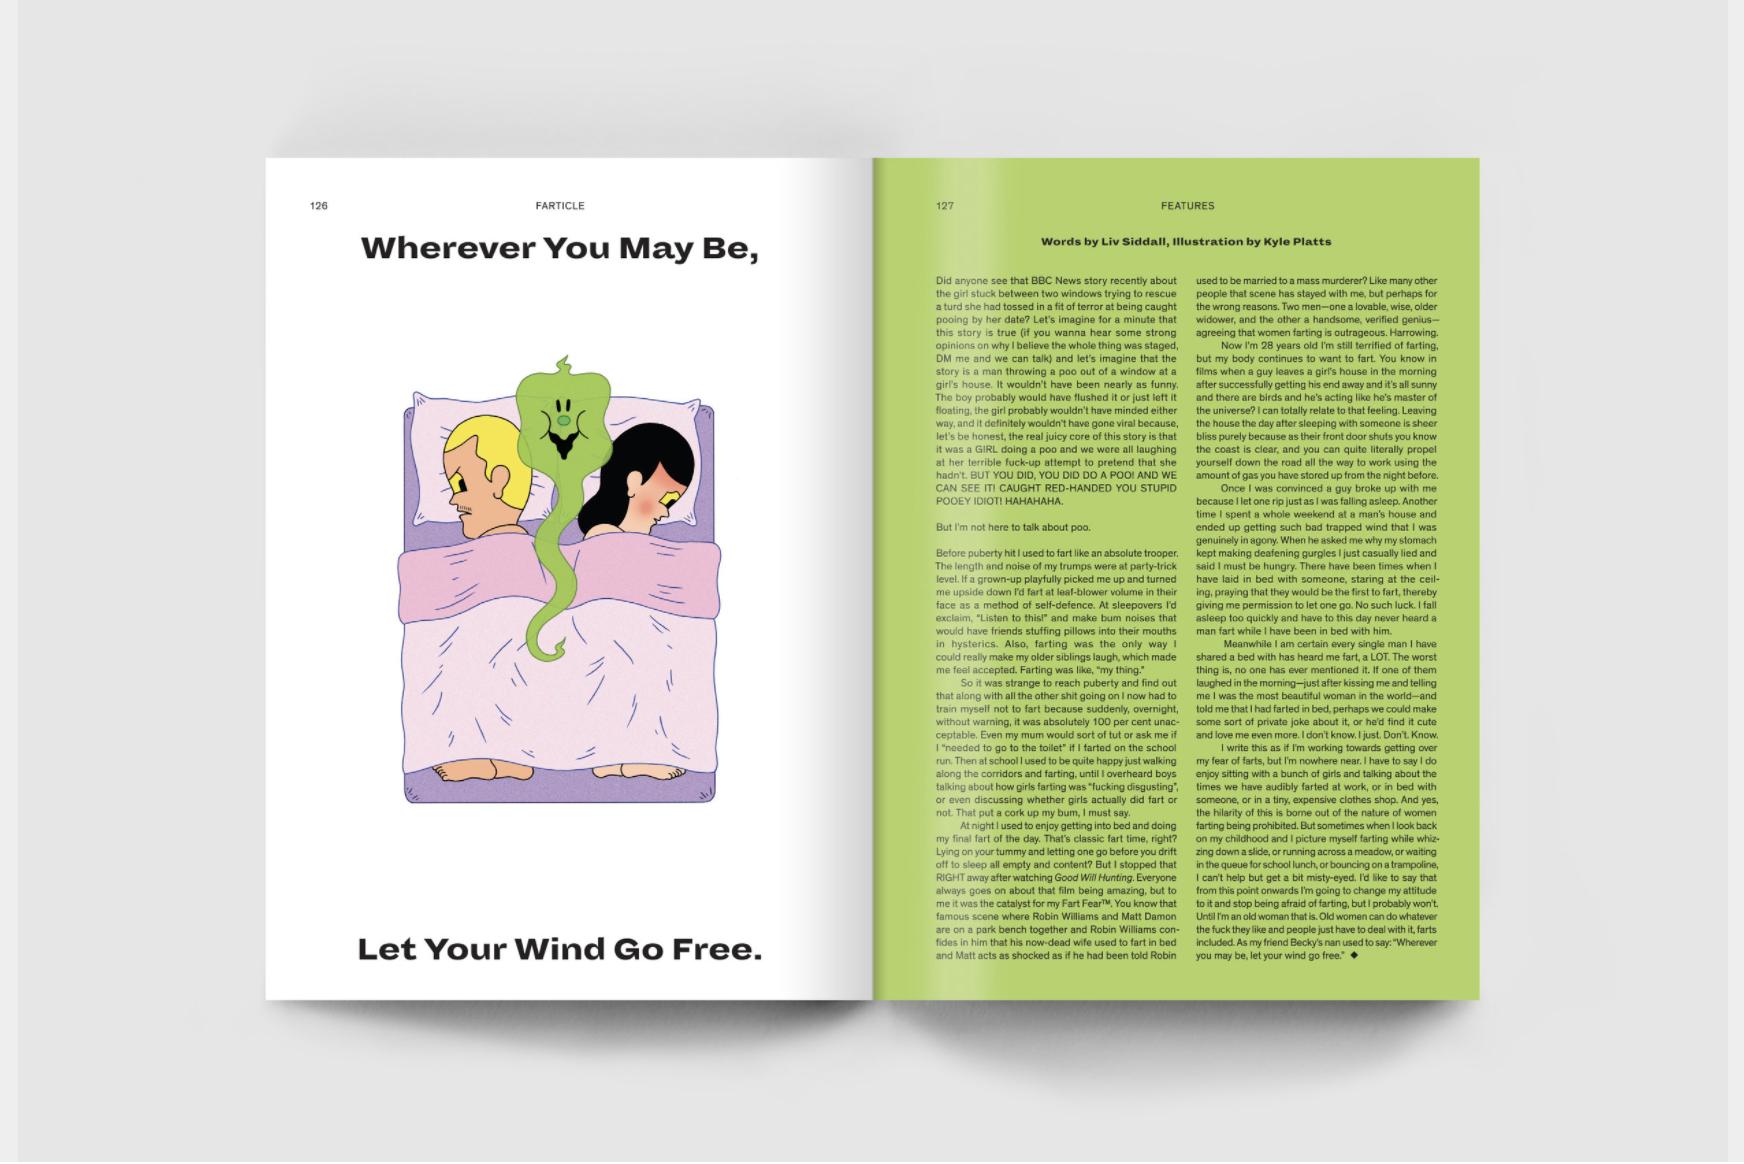 screenshot-www.ripostemagazine.com-2018-01-23-17-27-47-046.png